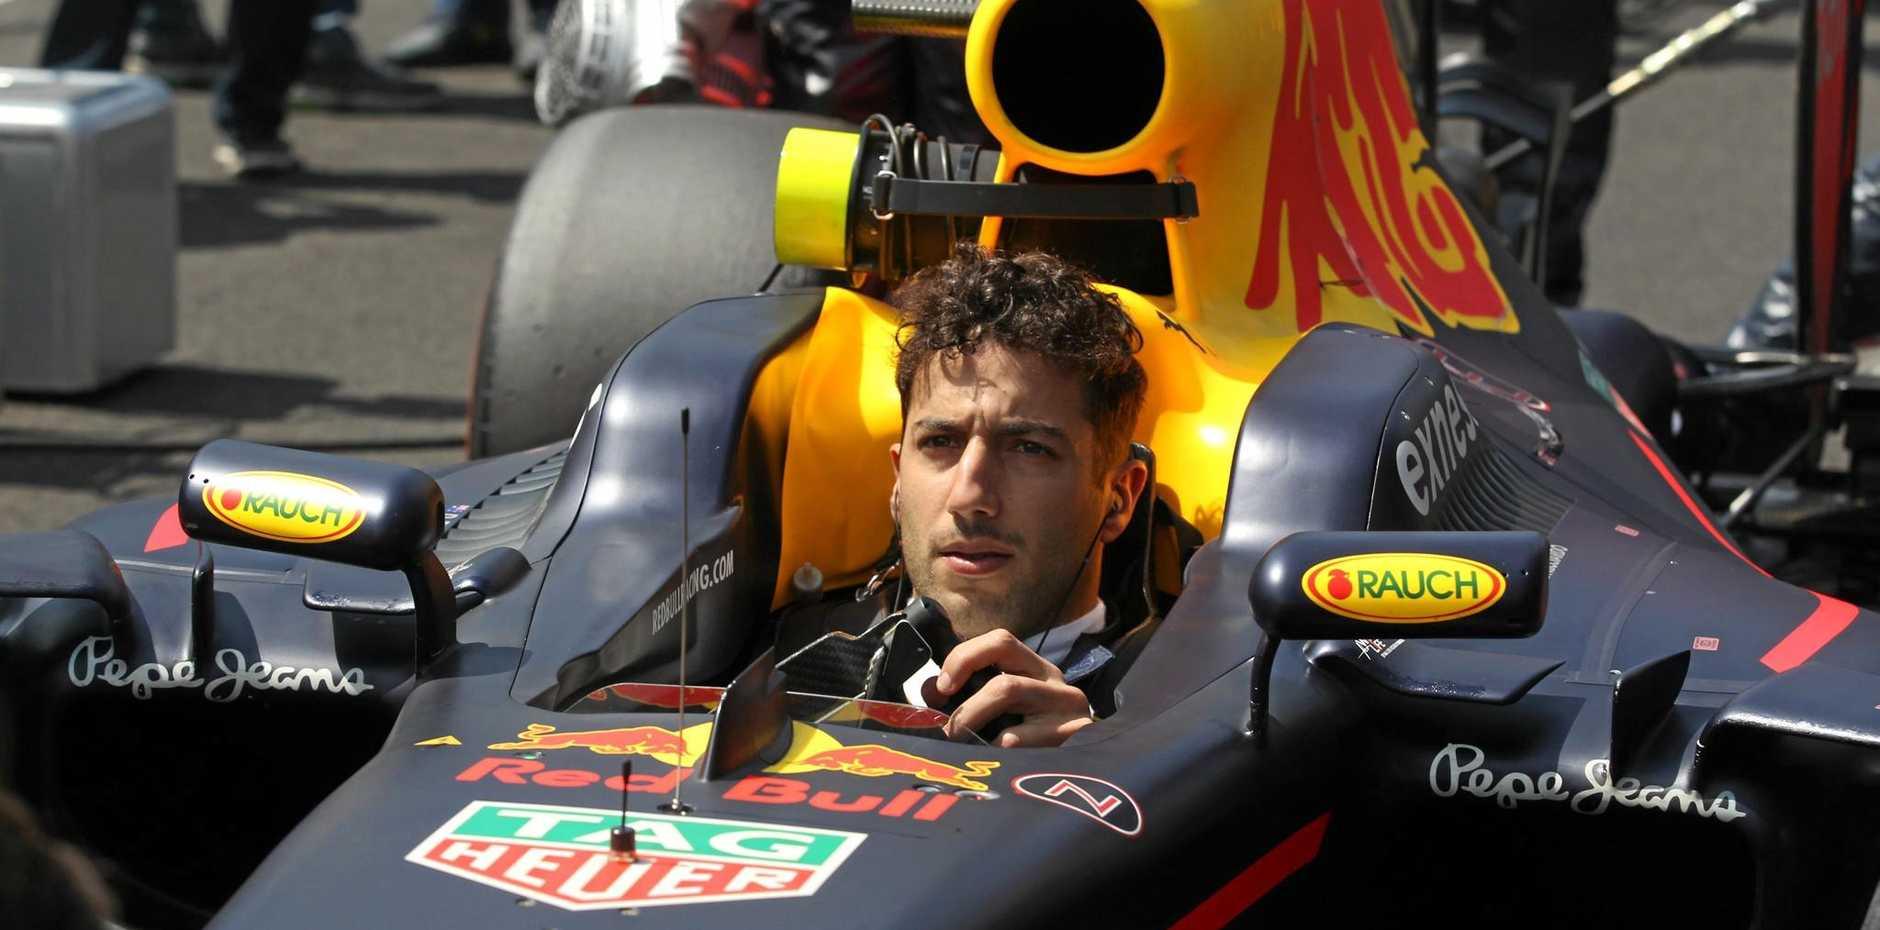 epa05610689 Australian driver Daniel Ricciardo of Red Bull Racing gets ready to compete during the Grand Prix of Formula One of Mexico at Autodromo Hermanos Rodriguez in Mexico City, Mexico, 30 October 2016.  EPA/ULISES RUIZ BASURTO